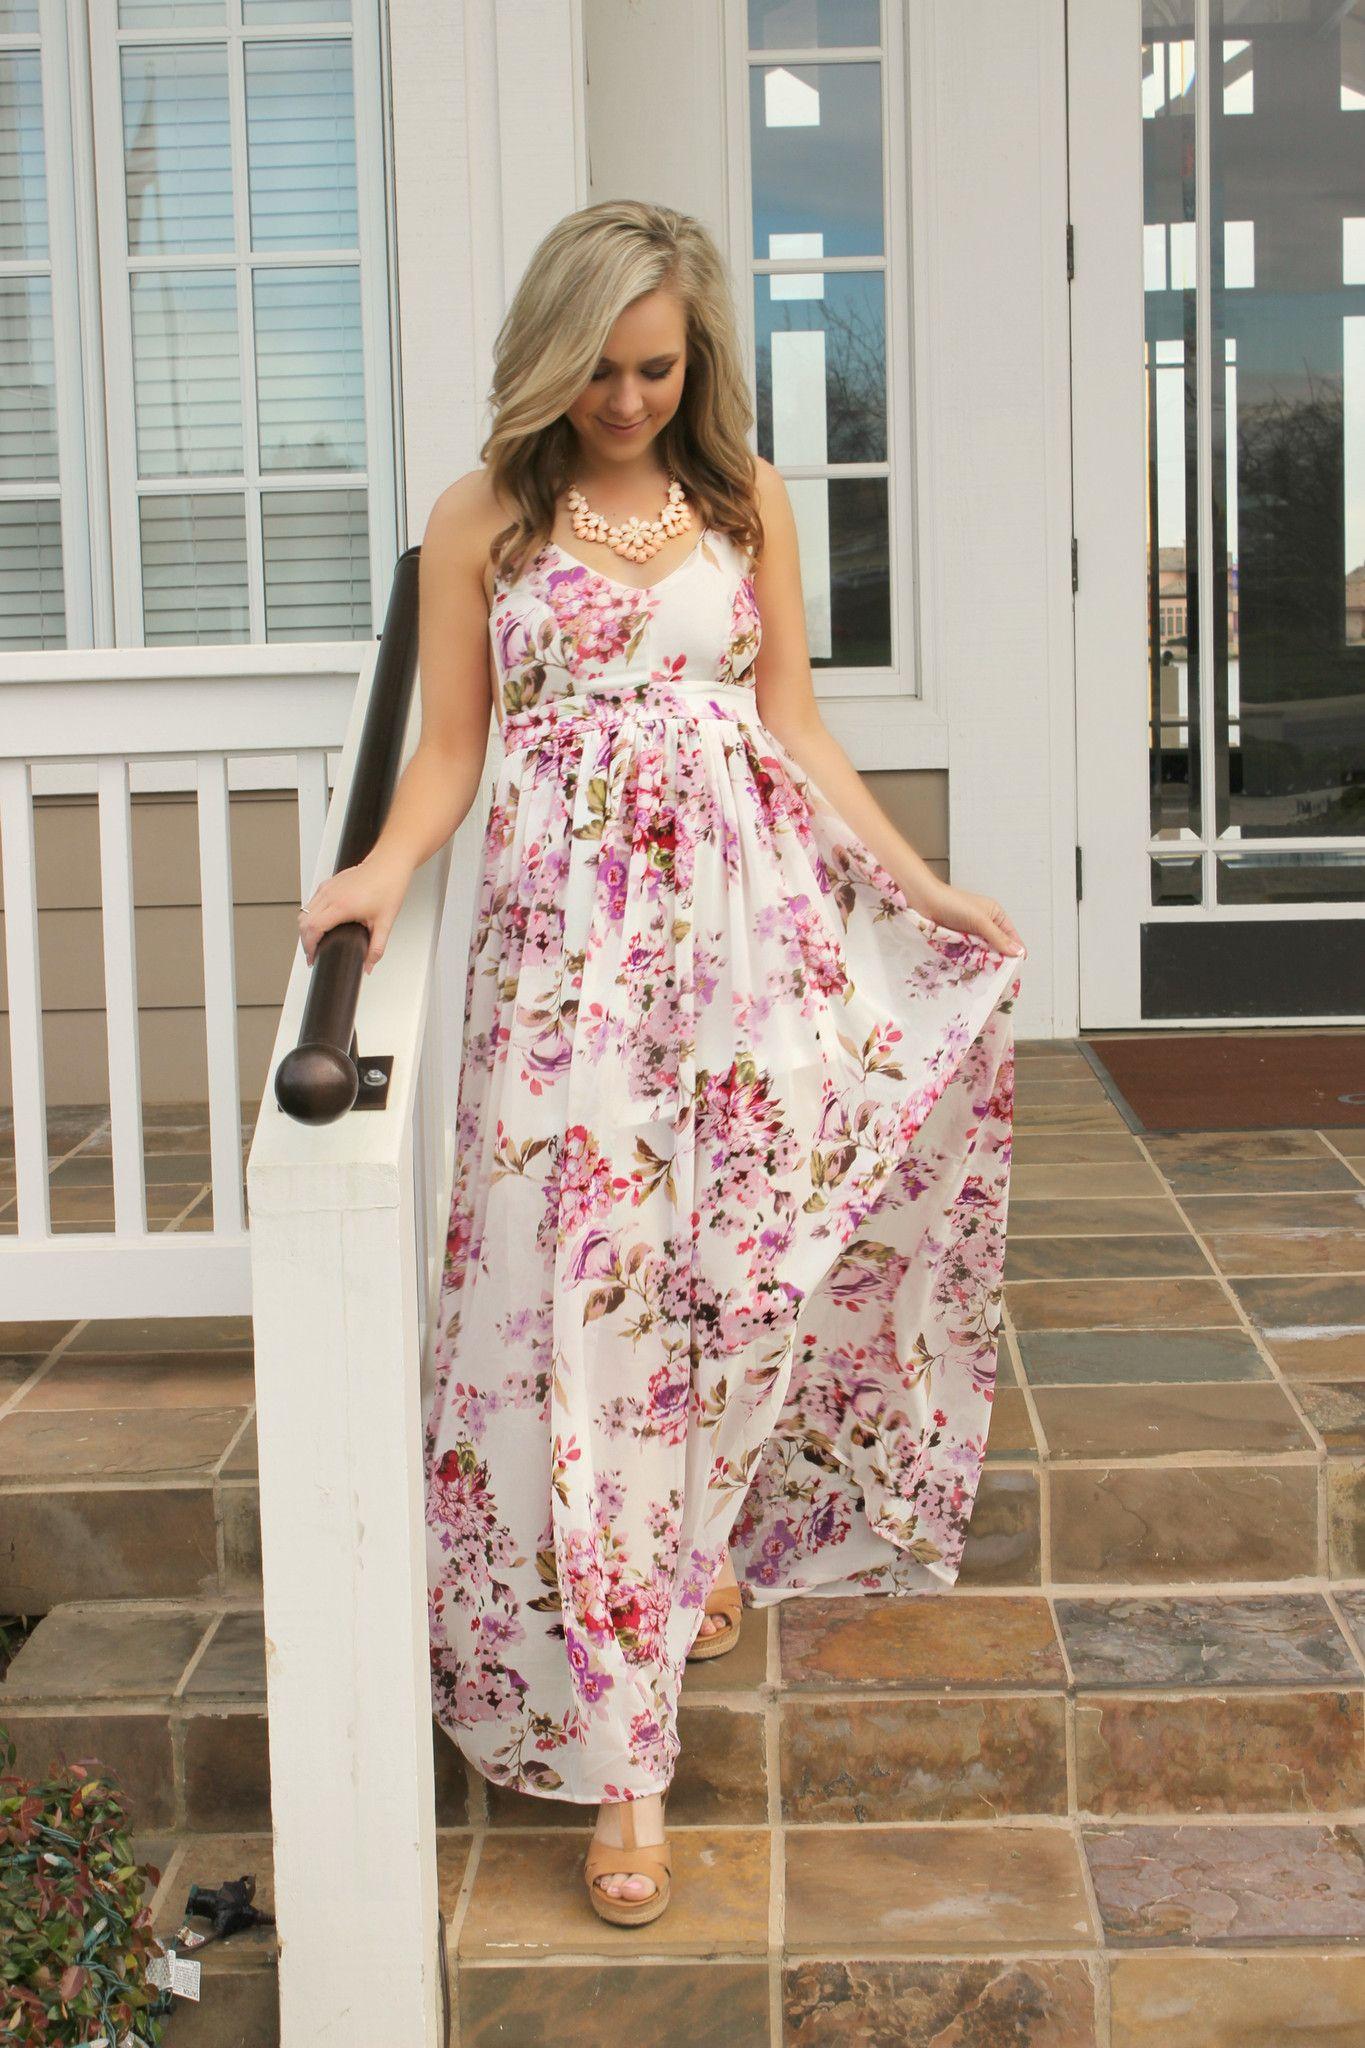 b9aecb2227278a Walking on Sunshine Dress